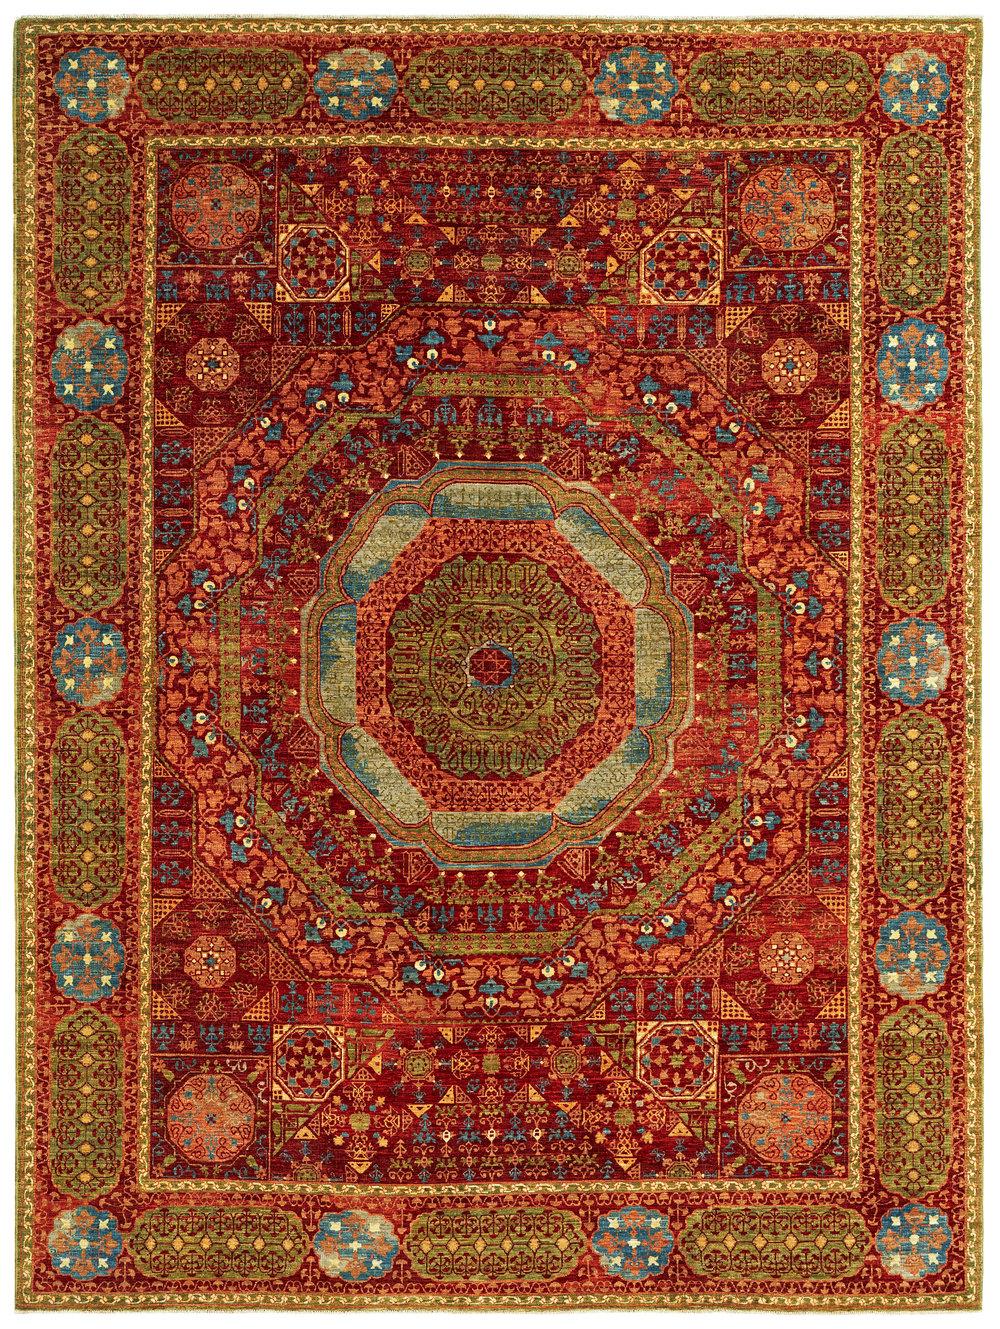 Mamluk Russet, Afghan, 9' x 12